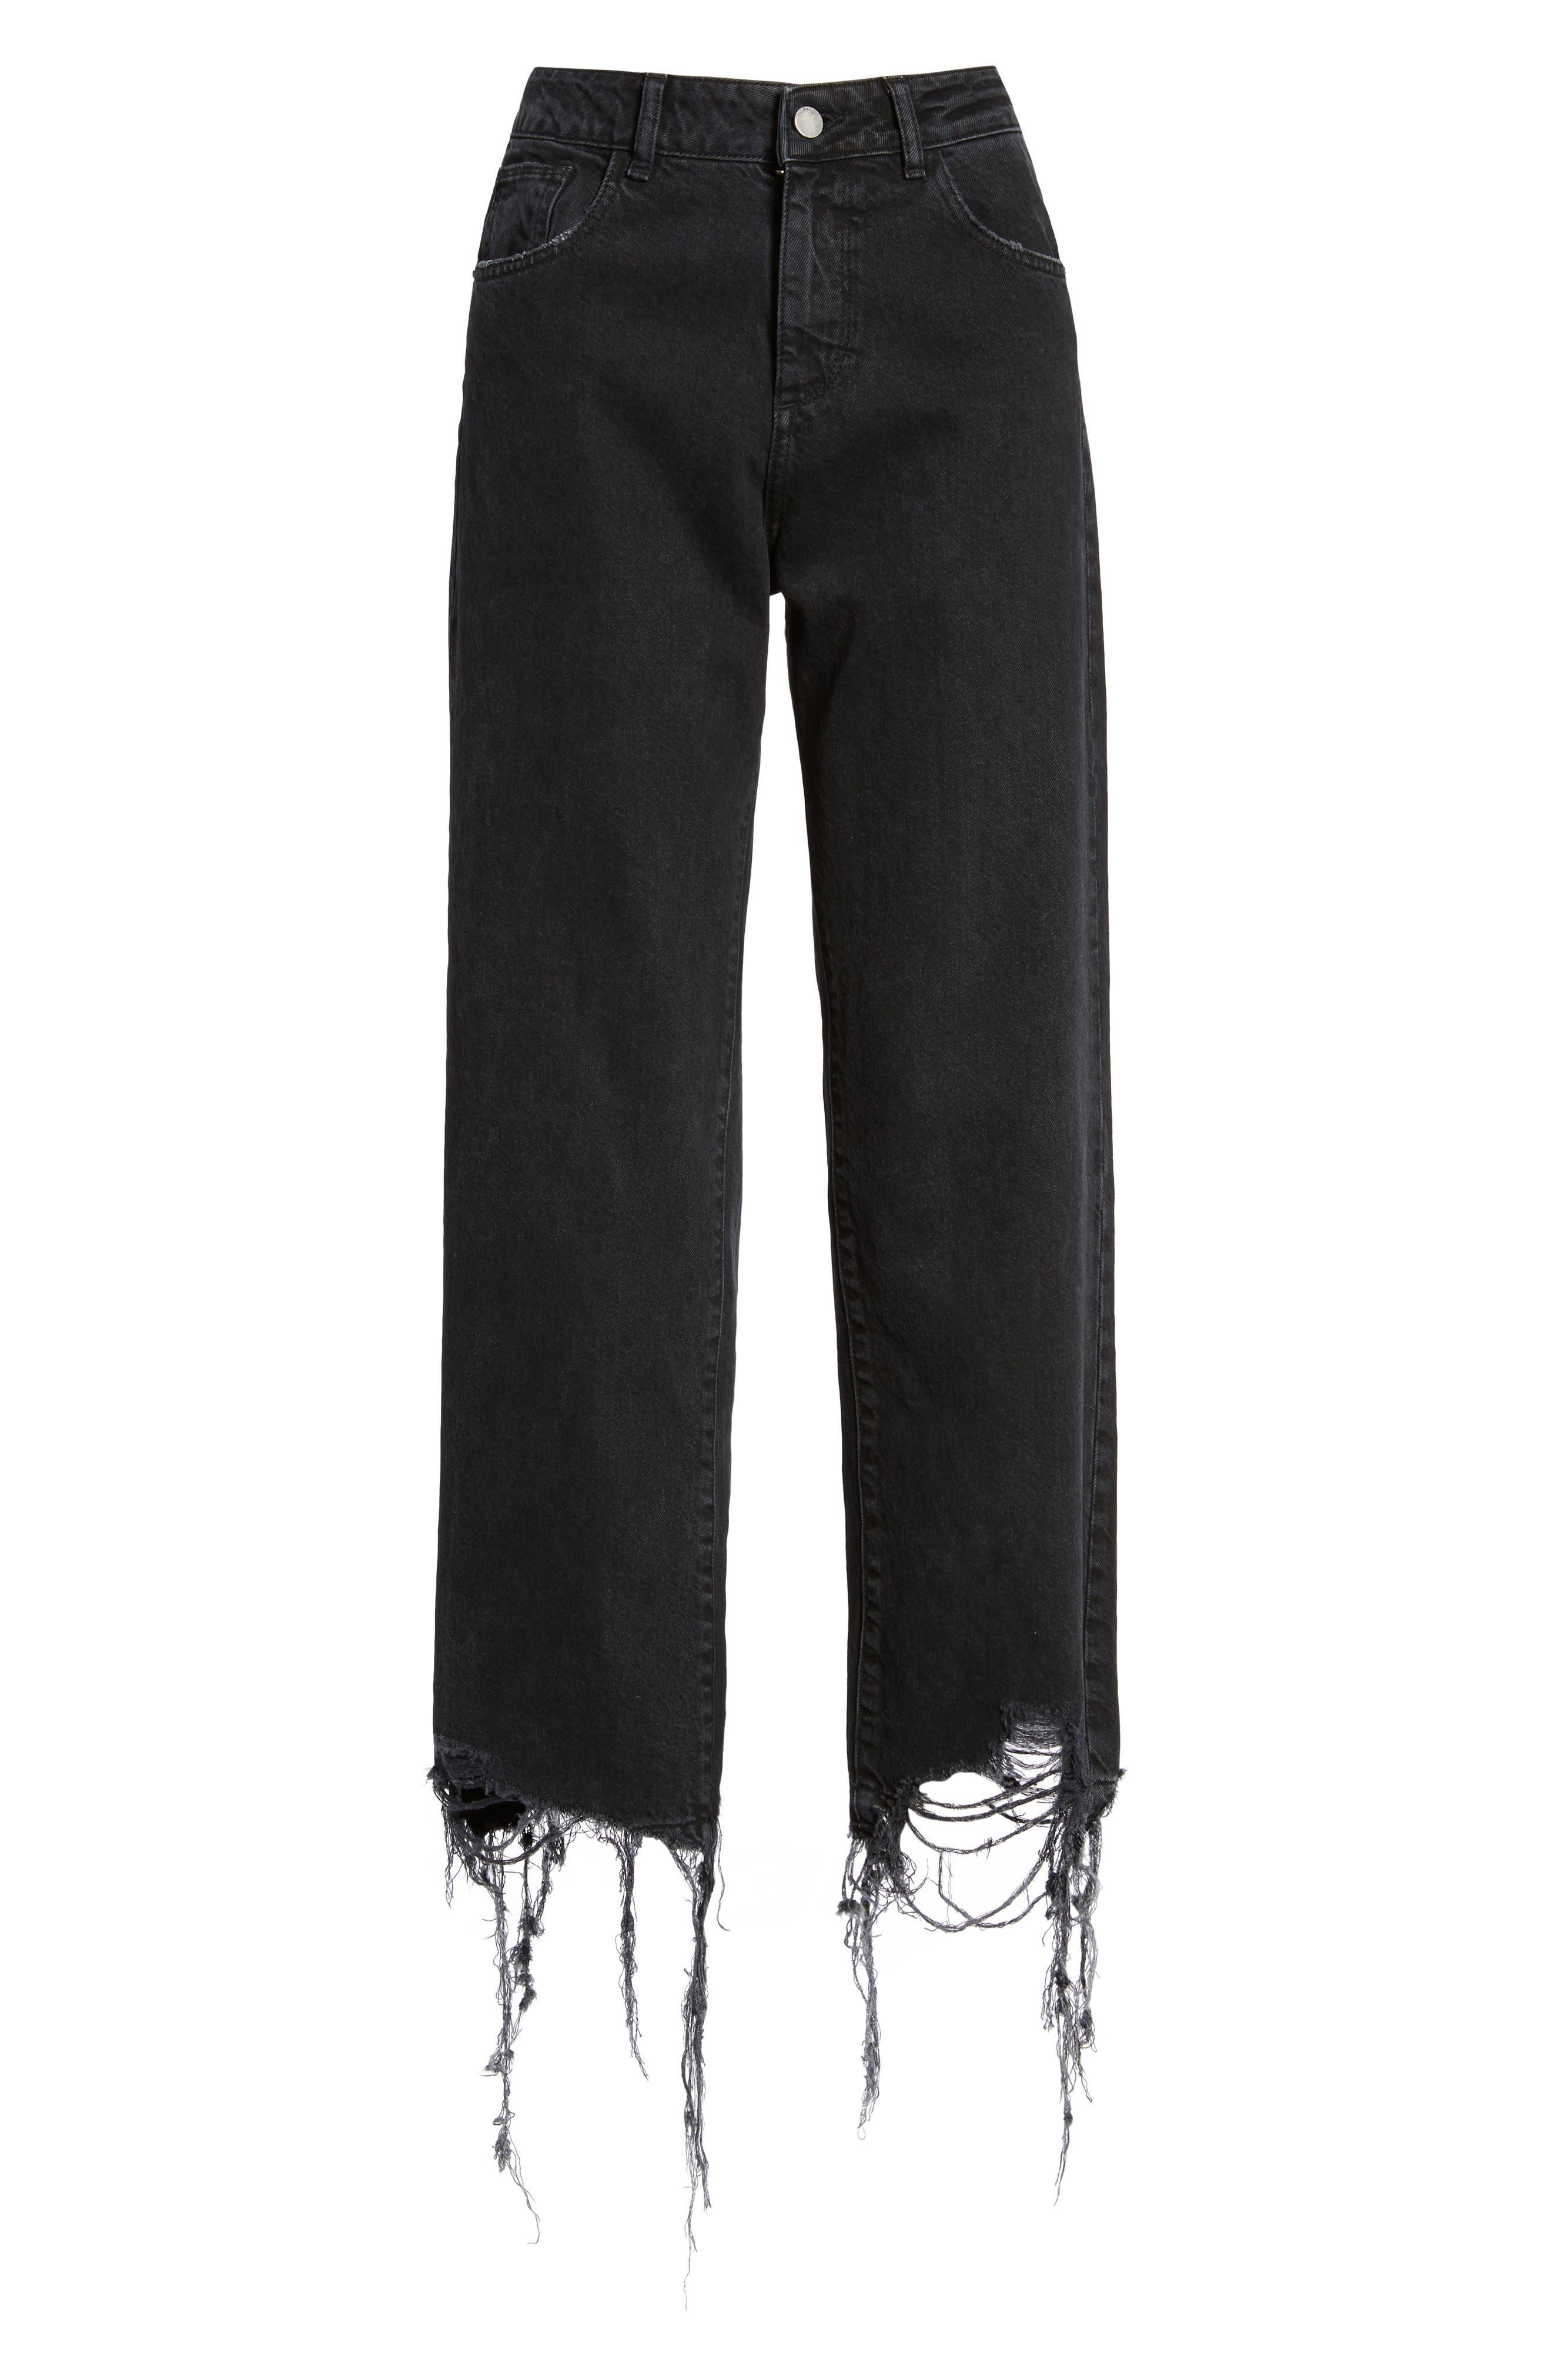 Hepburn High Waist Wide Leg Jeans,                             Alternate thumbnail 6, color,                             020